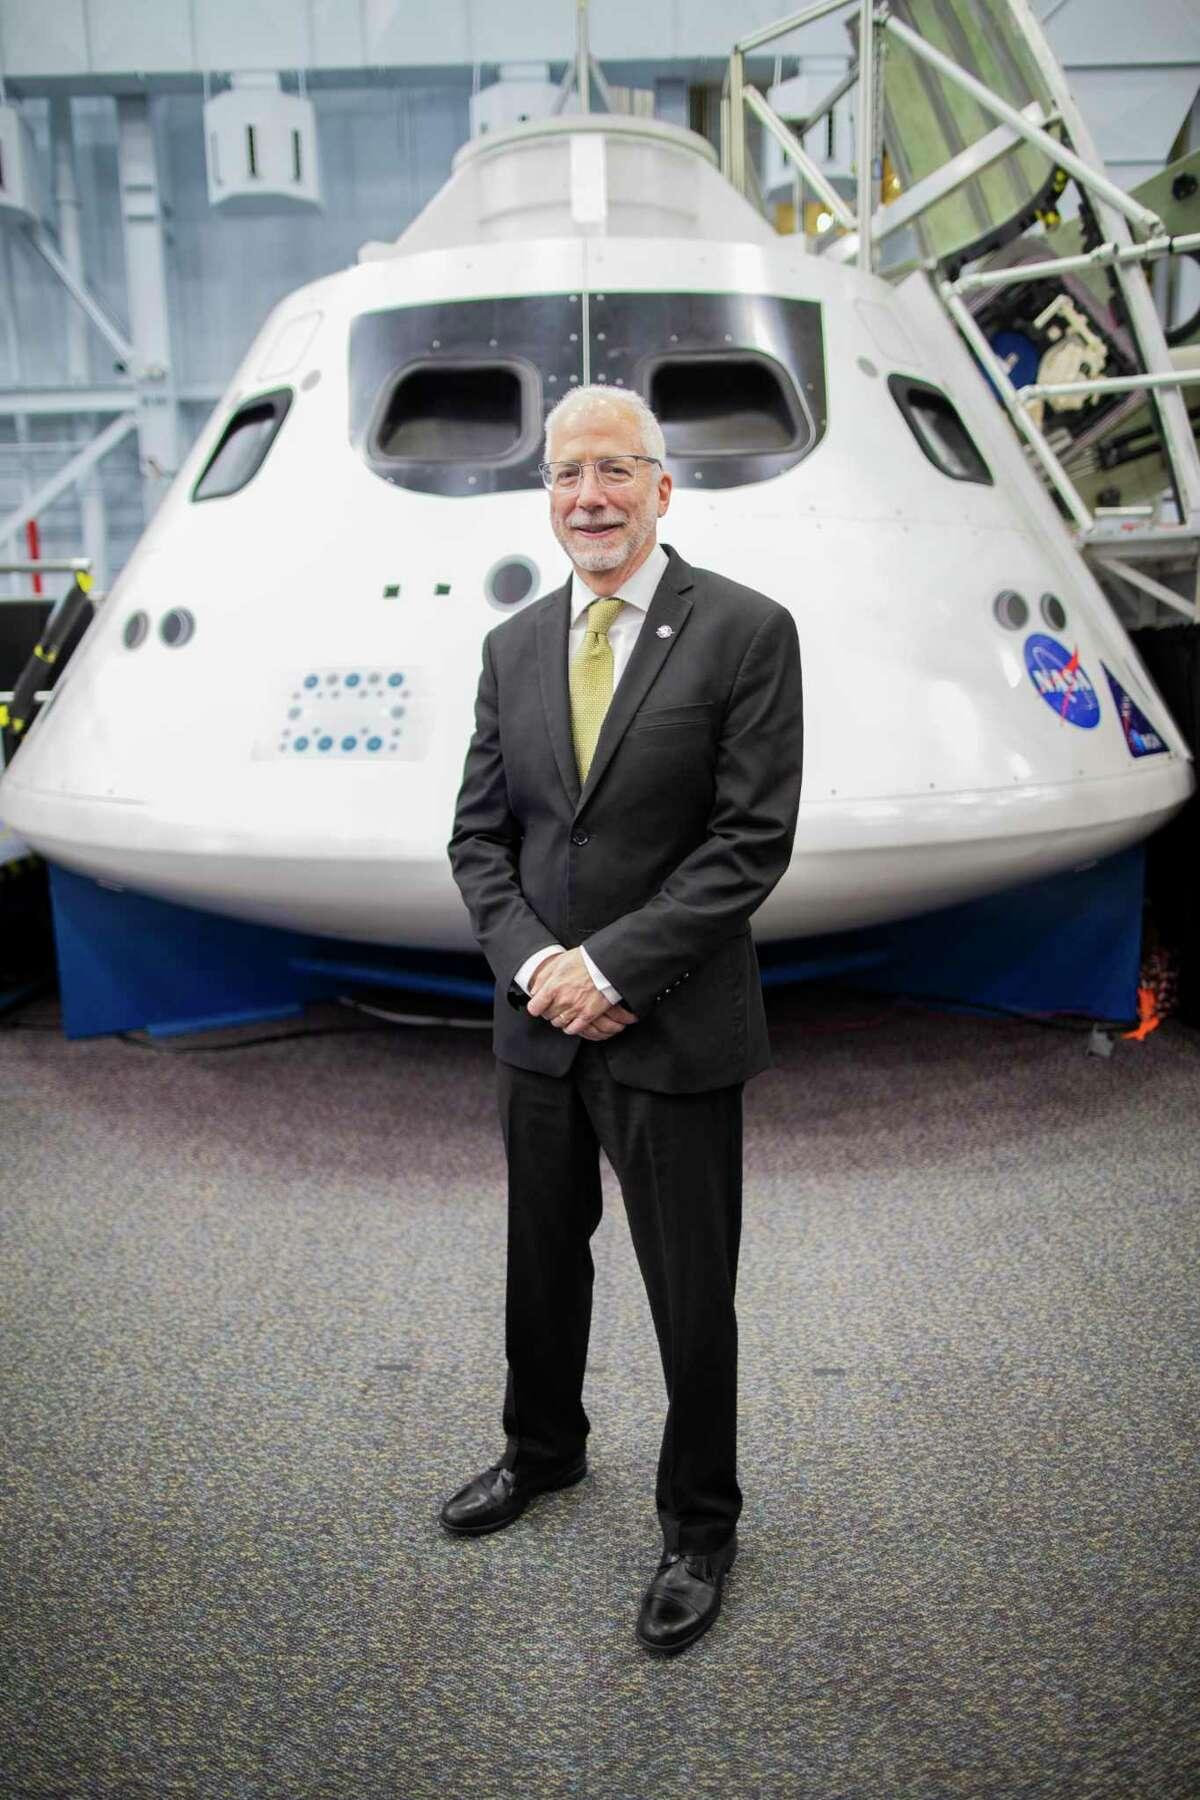 NASA's Johnson Space Center director Mark Geyer on Monday, Feb. 10, 2020 in Houston.